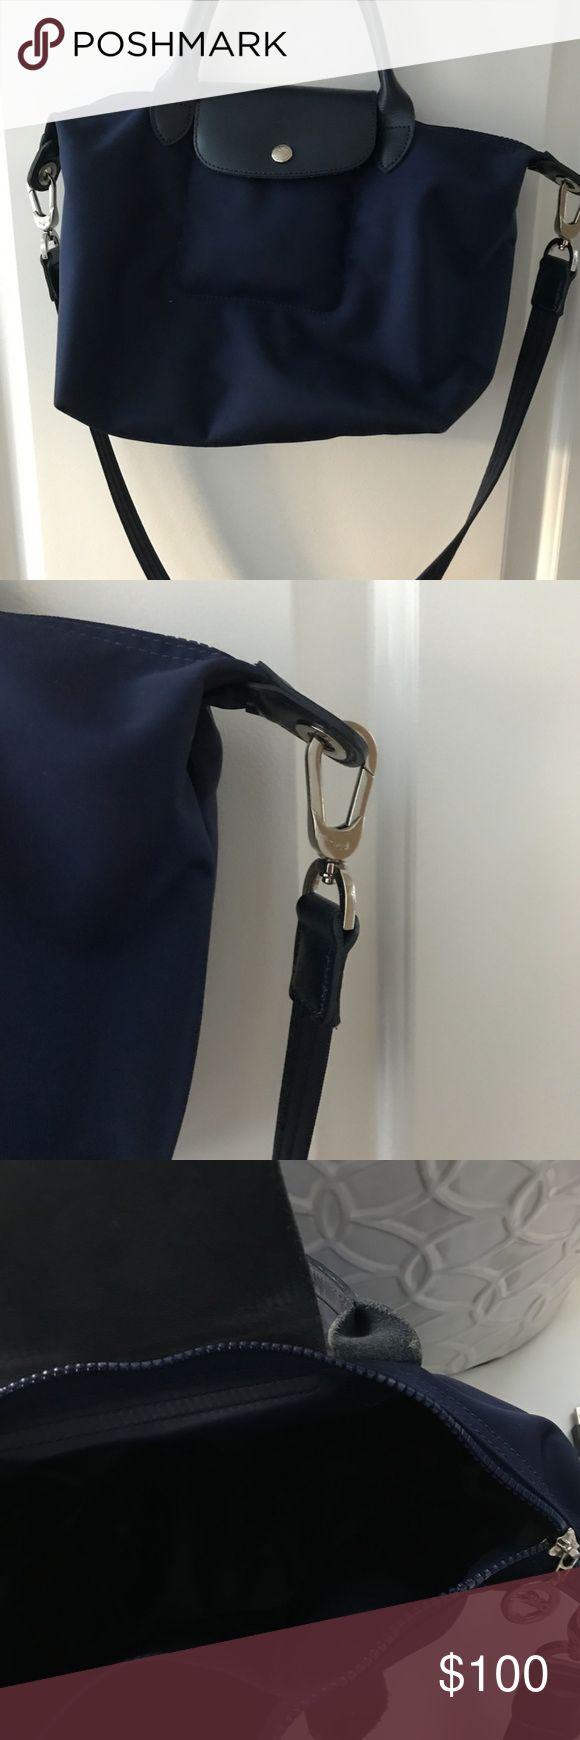 NEW Longchamp Le Pliage Navy Shoulder Bag Beautful longchamp bag. Very very good condition. Longchamp Bags Shoulder Bags